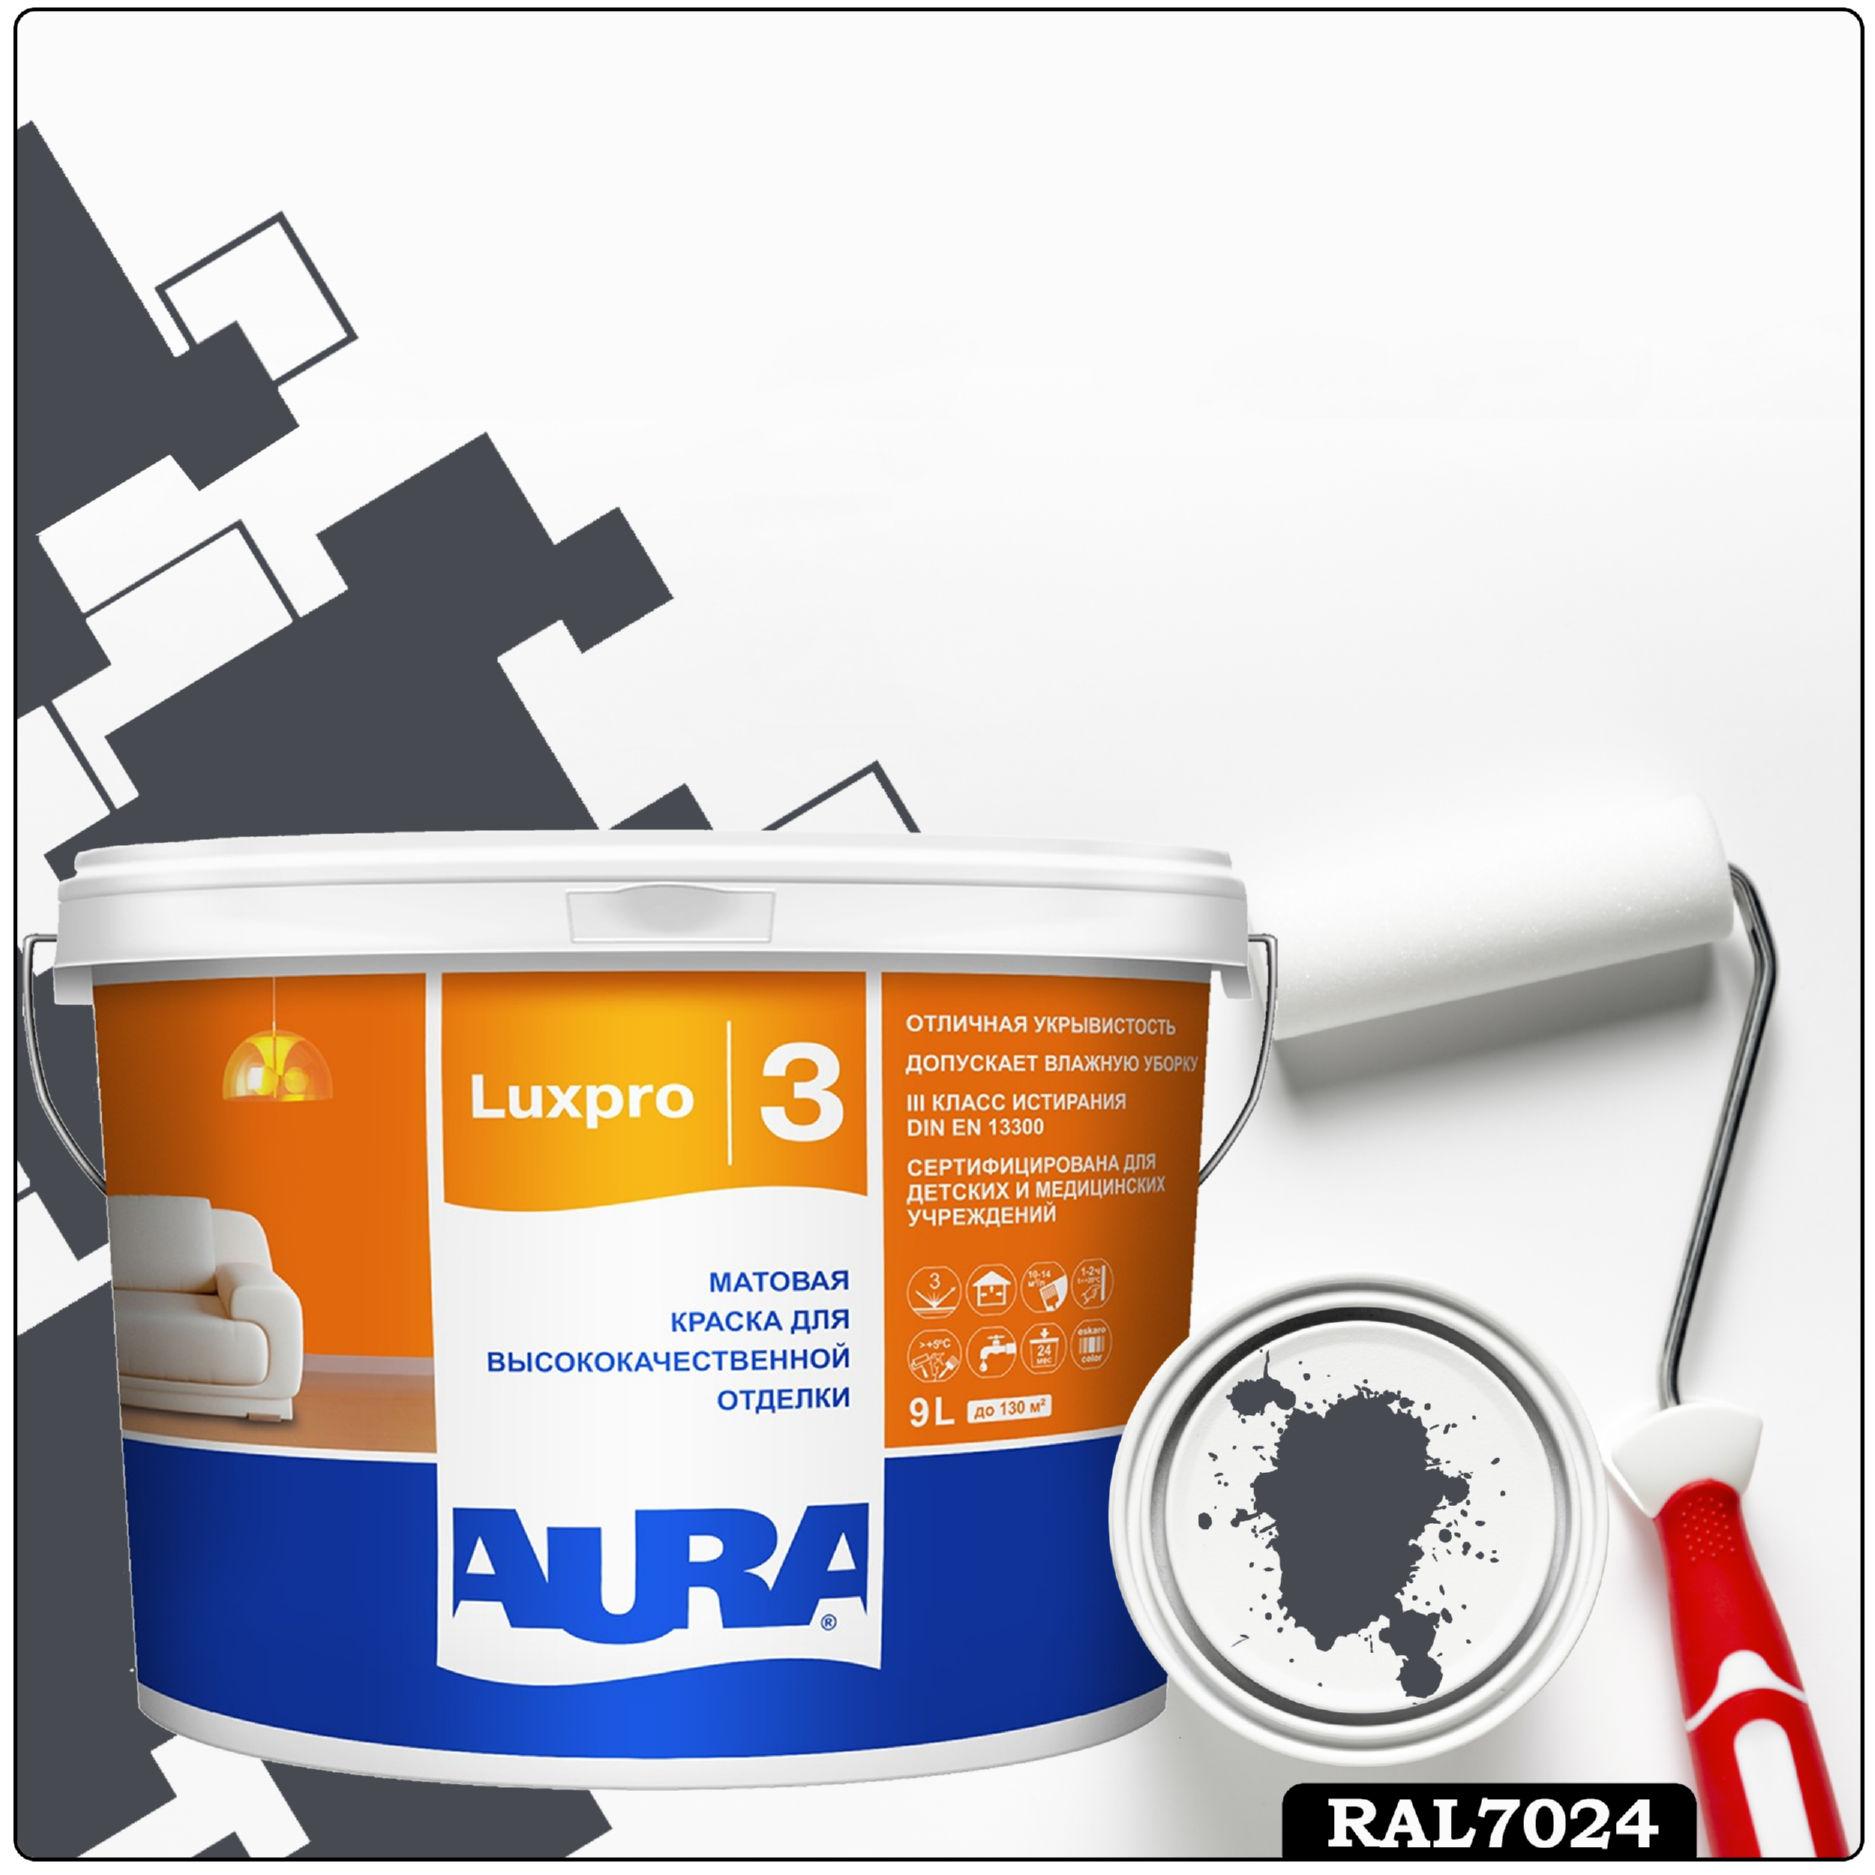 Фото 19 - Краска Aura LuxPRO 3, RAL 7024 Графитовый серый, латексная, шелково-матовая, интерьерная, 9л, Аура.